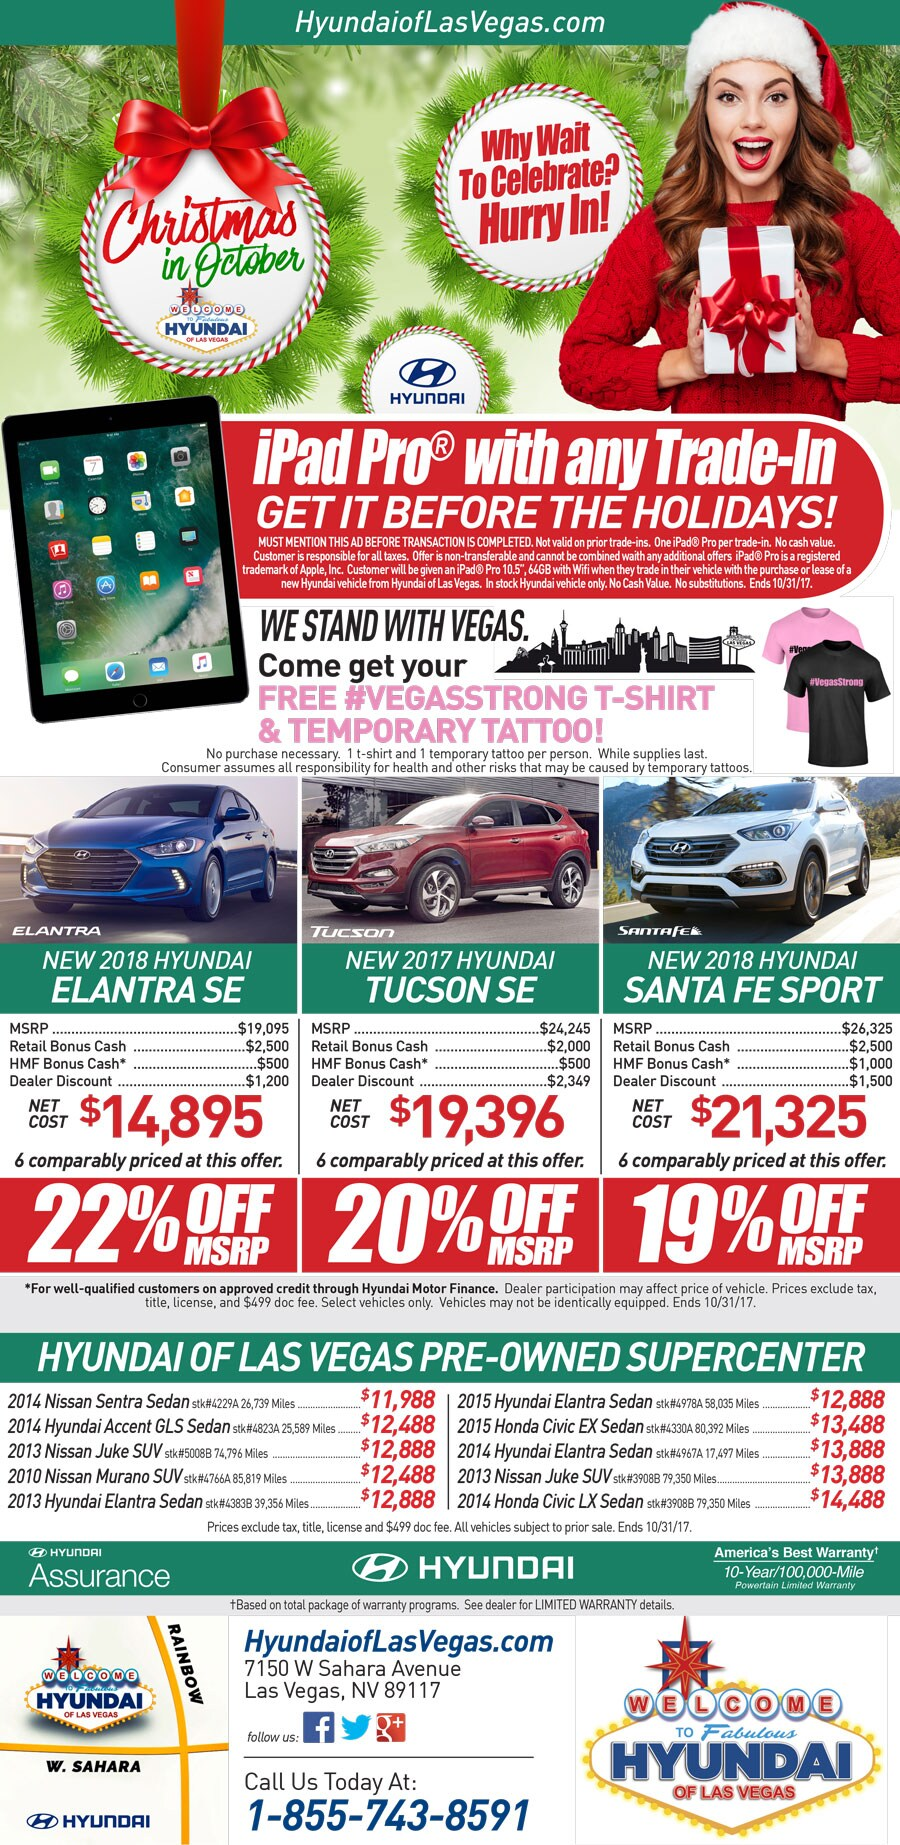 Hyundai Of Las Vegas | New Hyundai dealership in Las Vegas, NV 89117